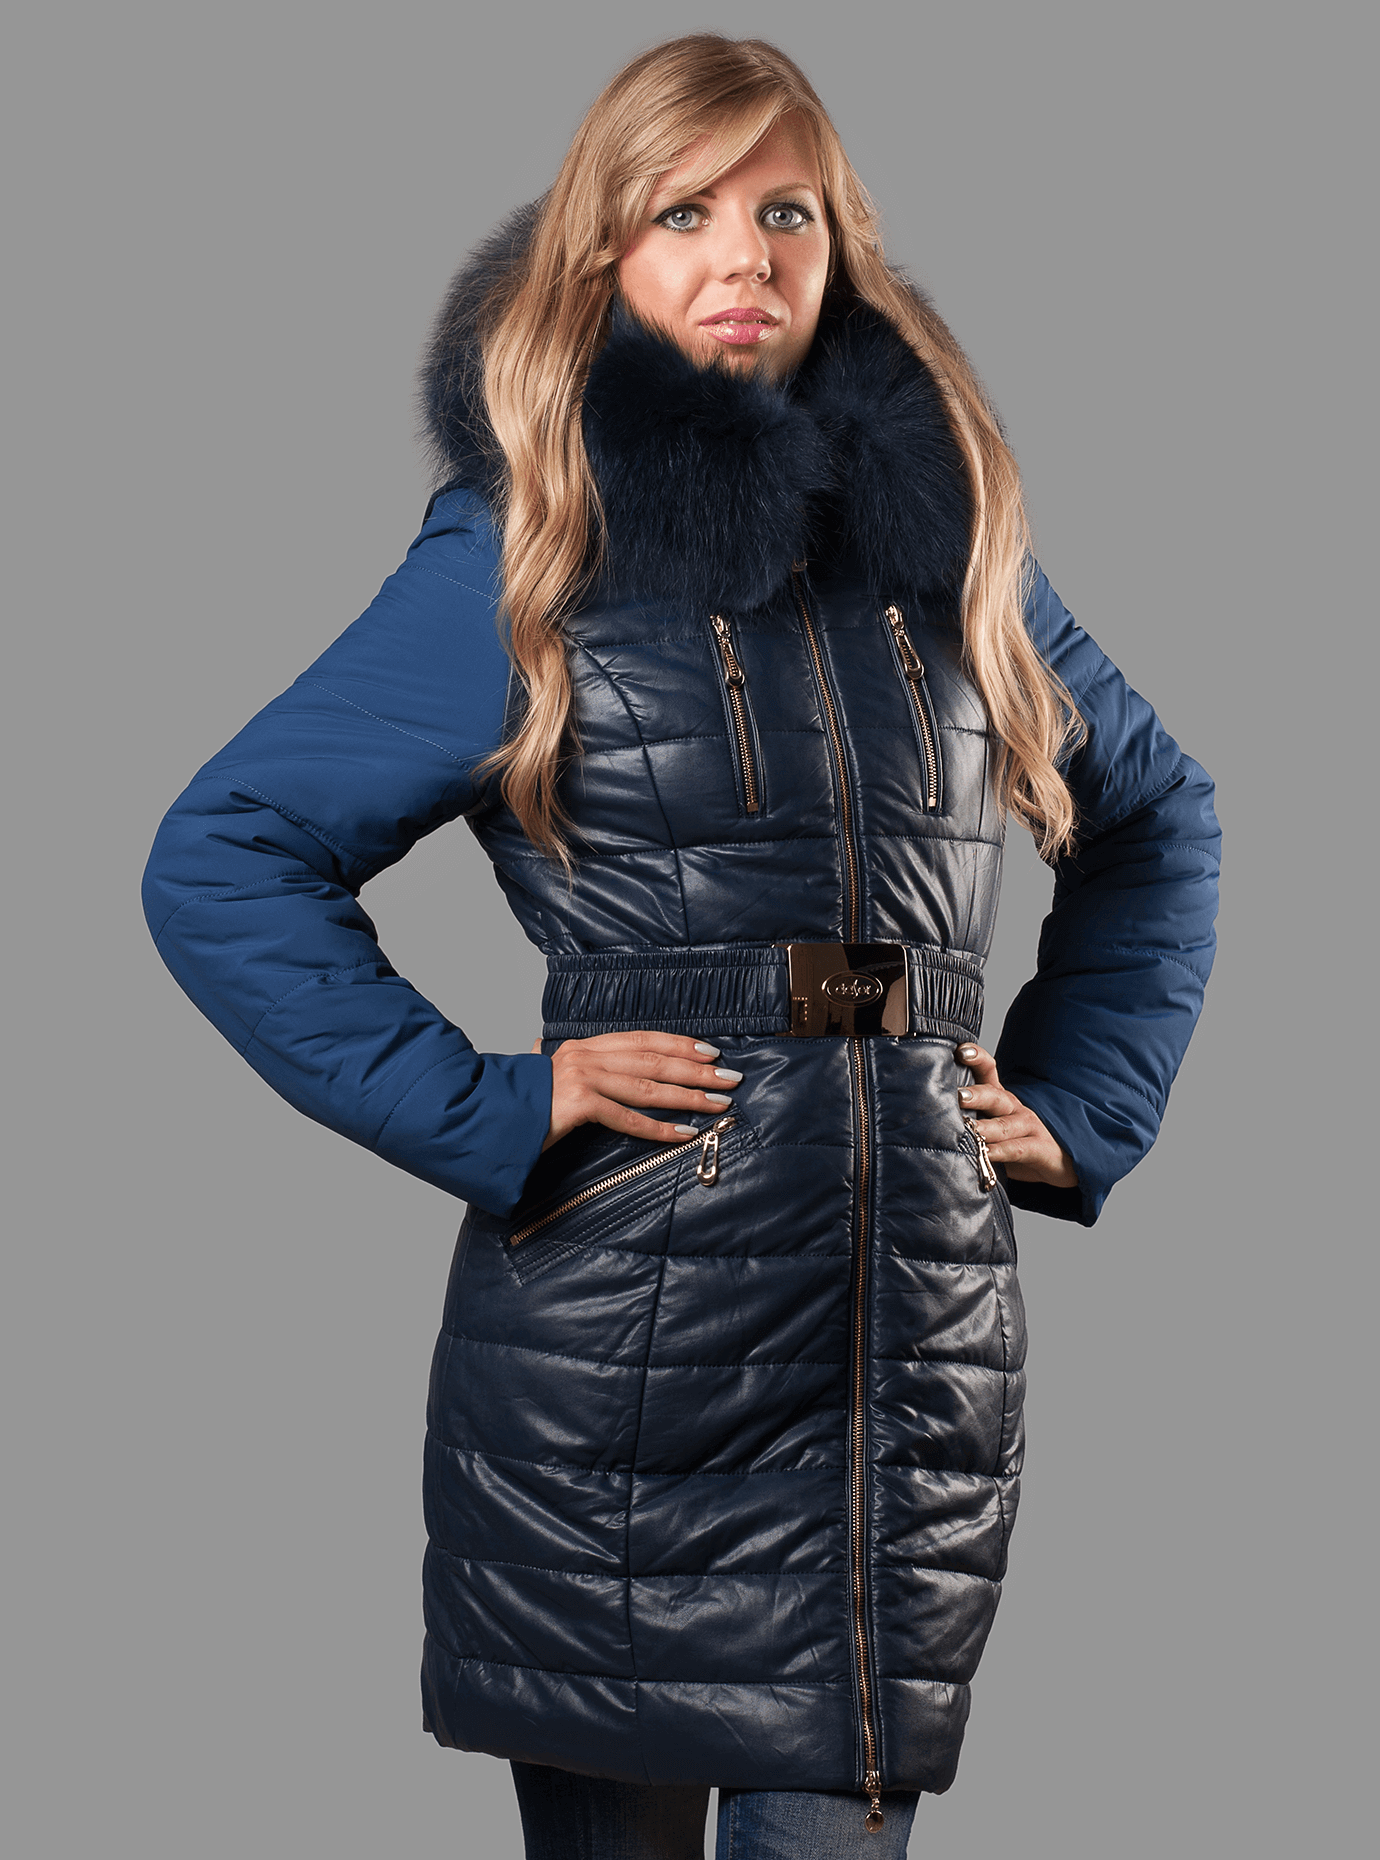 Куртка женская зимняя с мехом енота Тёмно-синий S (05-ZZ19033): фото - Alster.ua